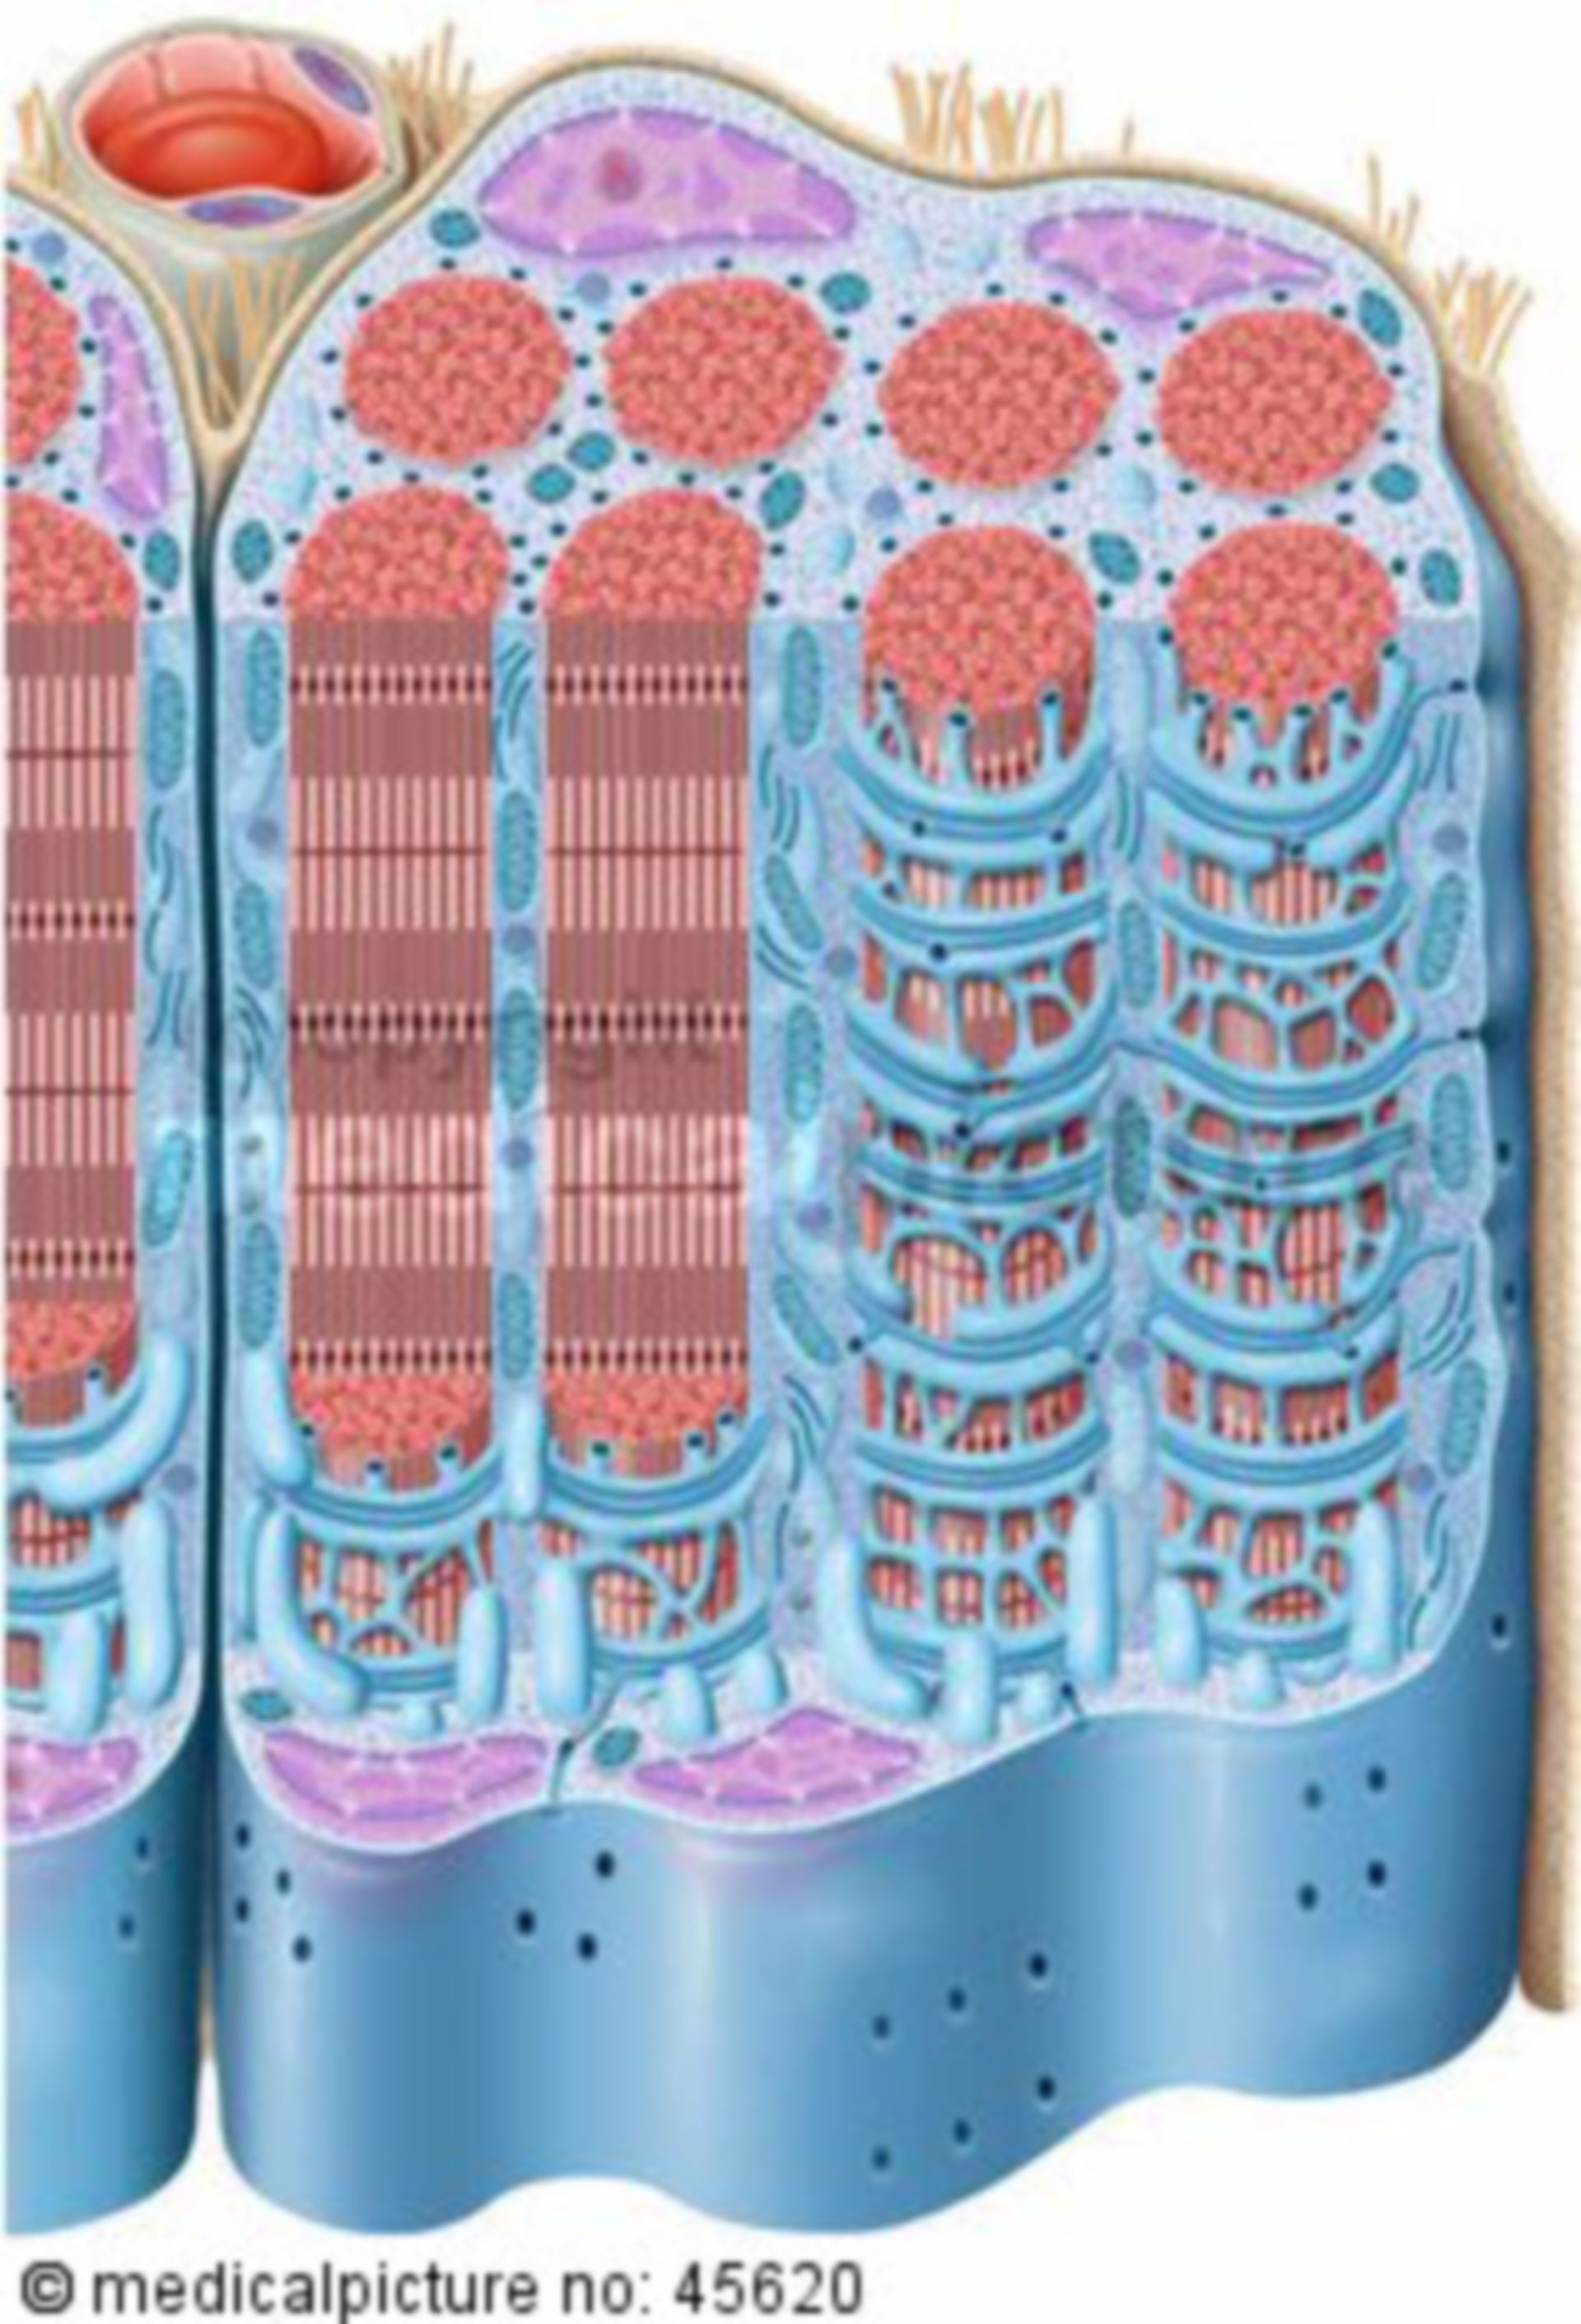 Skeletal musculature